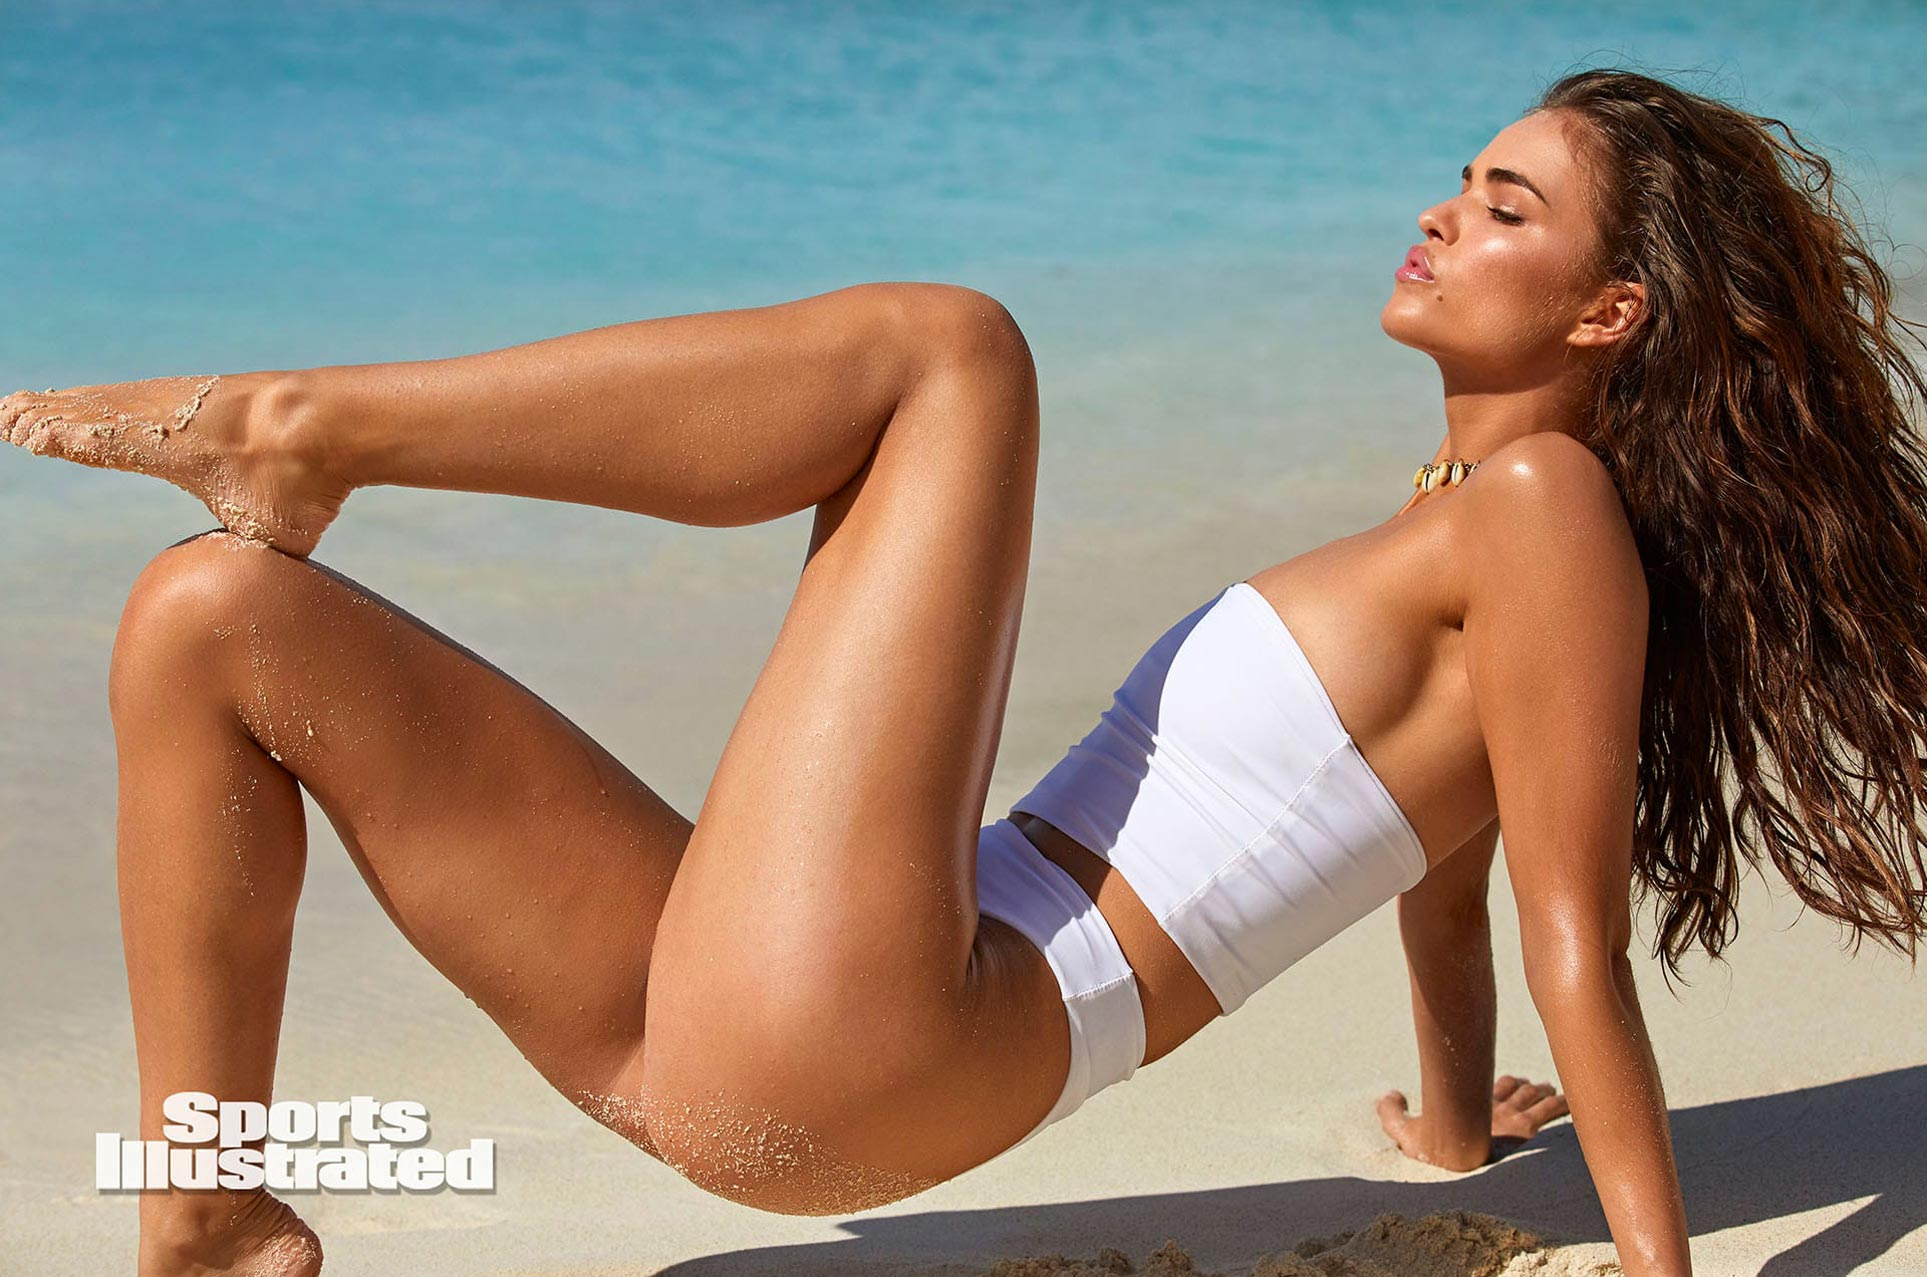 Робин Хольцкен в каталоге купальников Sports Illustrated Swimsuit 2020 / фото 13